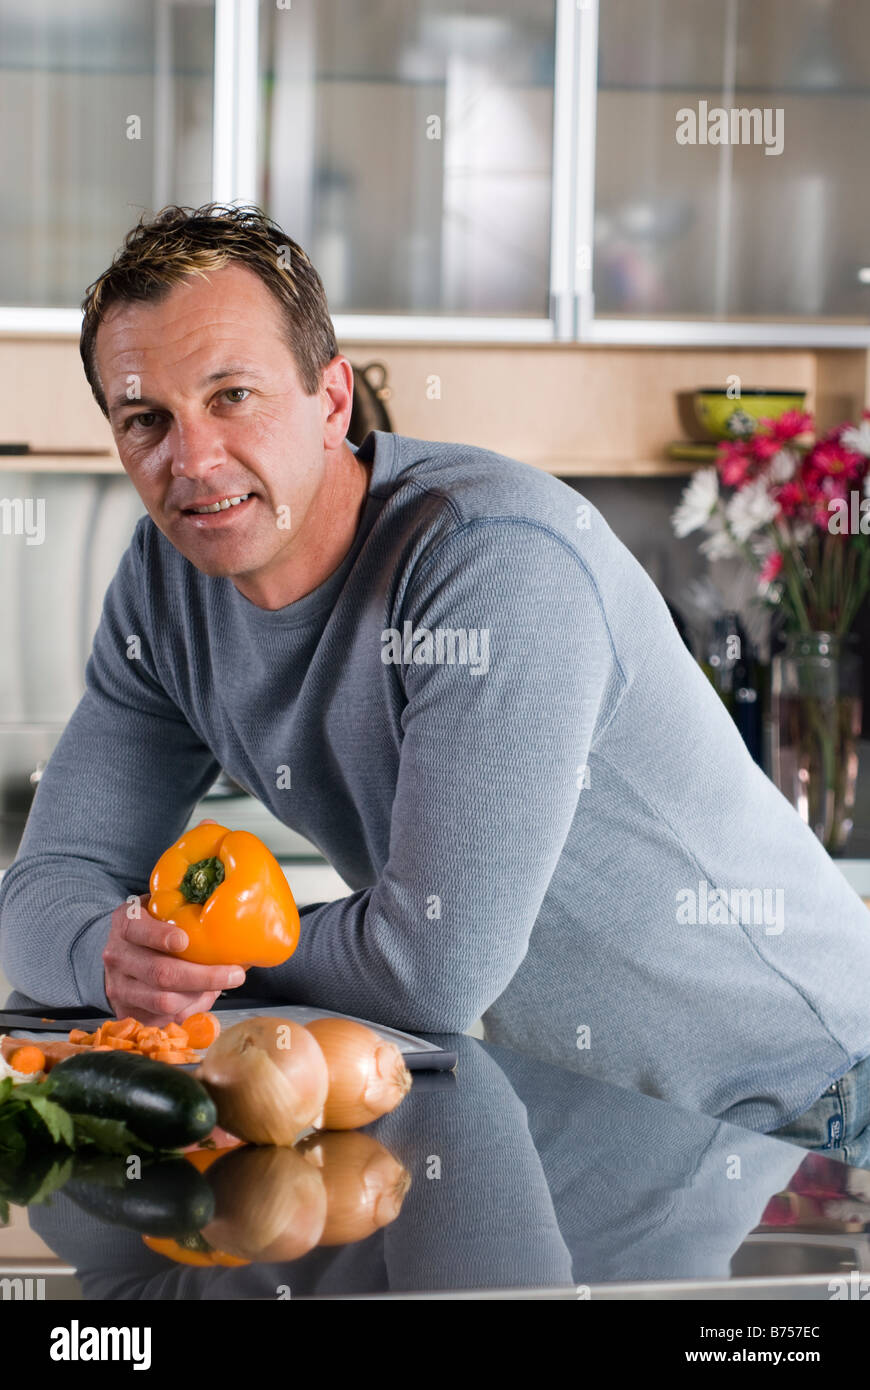 Uomo con verdure in cucina, Winnipeg, Canada Immagini Stock